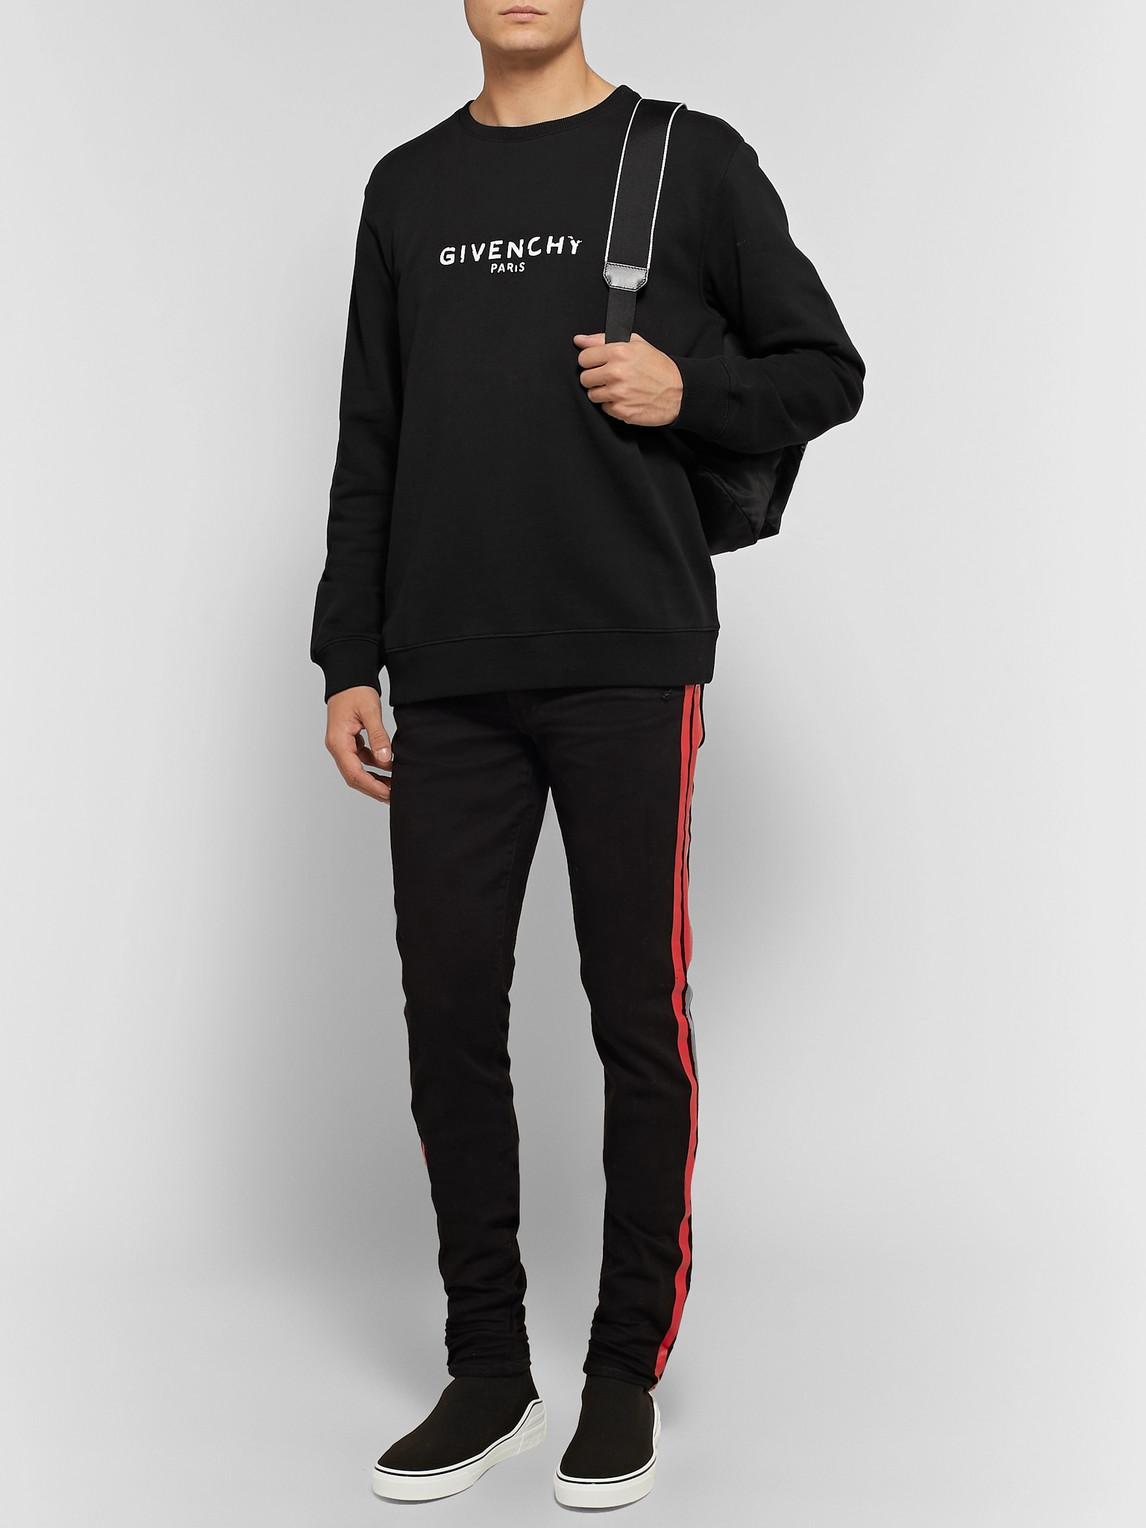 Givenchy T-shirts DISTRESSED LOGO-PRINT LOOPBACK COTTON-JERSEY SWEATSHIRT